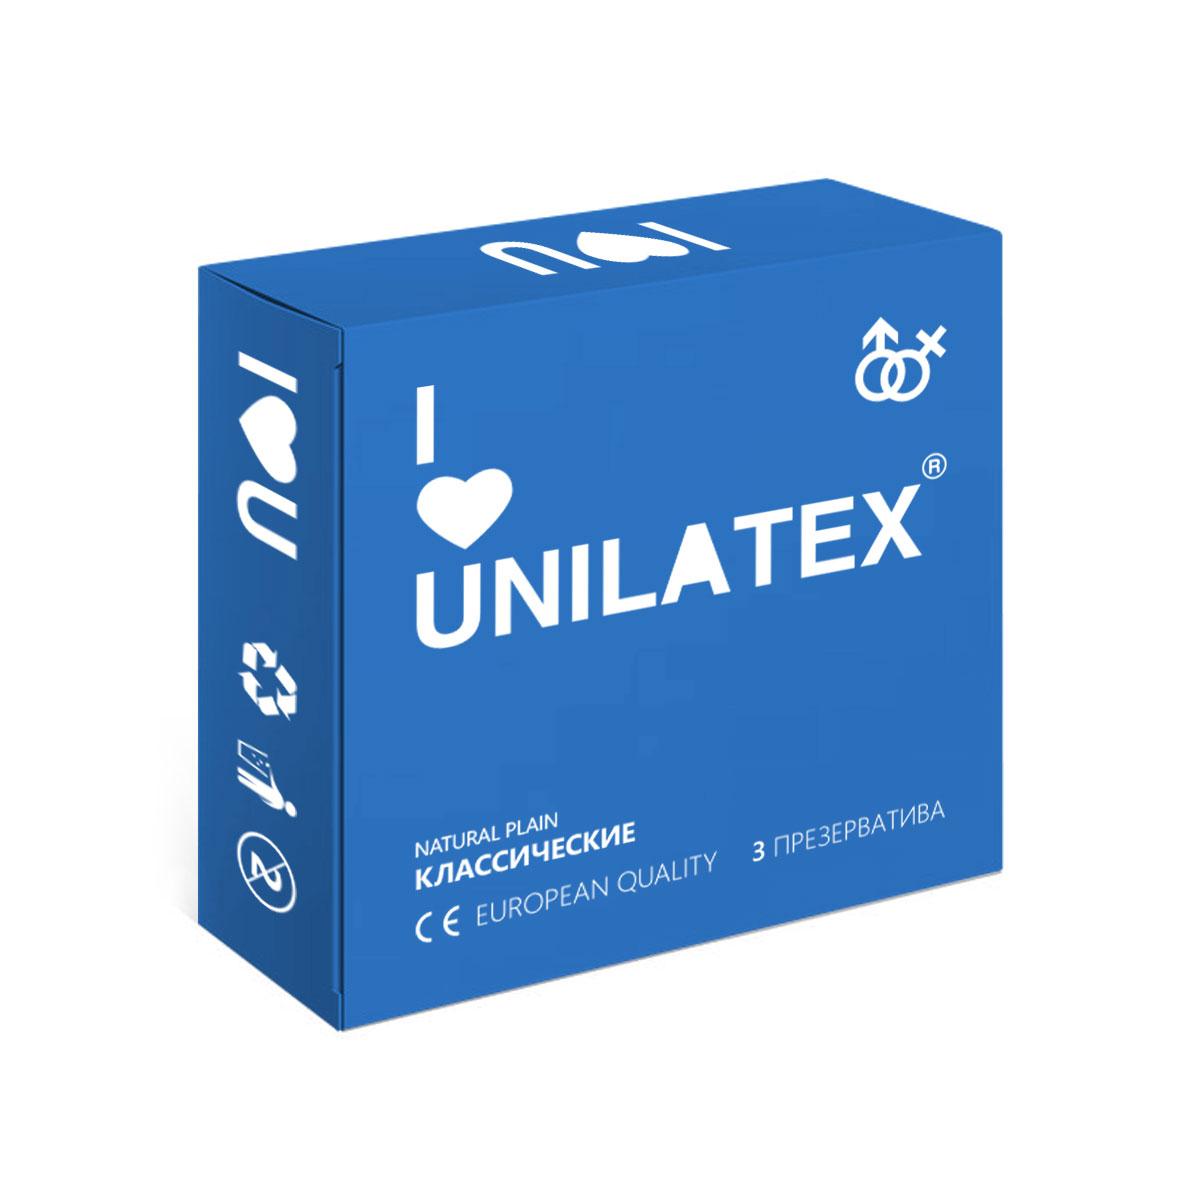 Презервативы Unilatex Natural Plain, 3 шт ( Ref. 3002 )